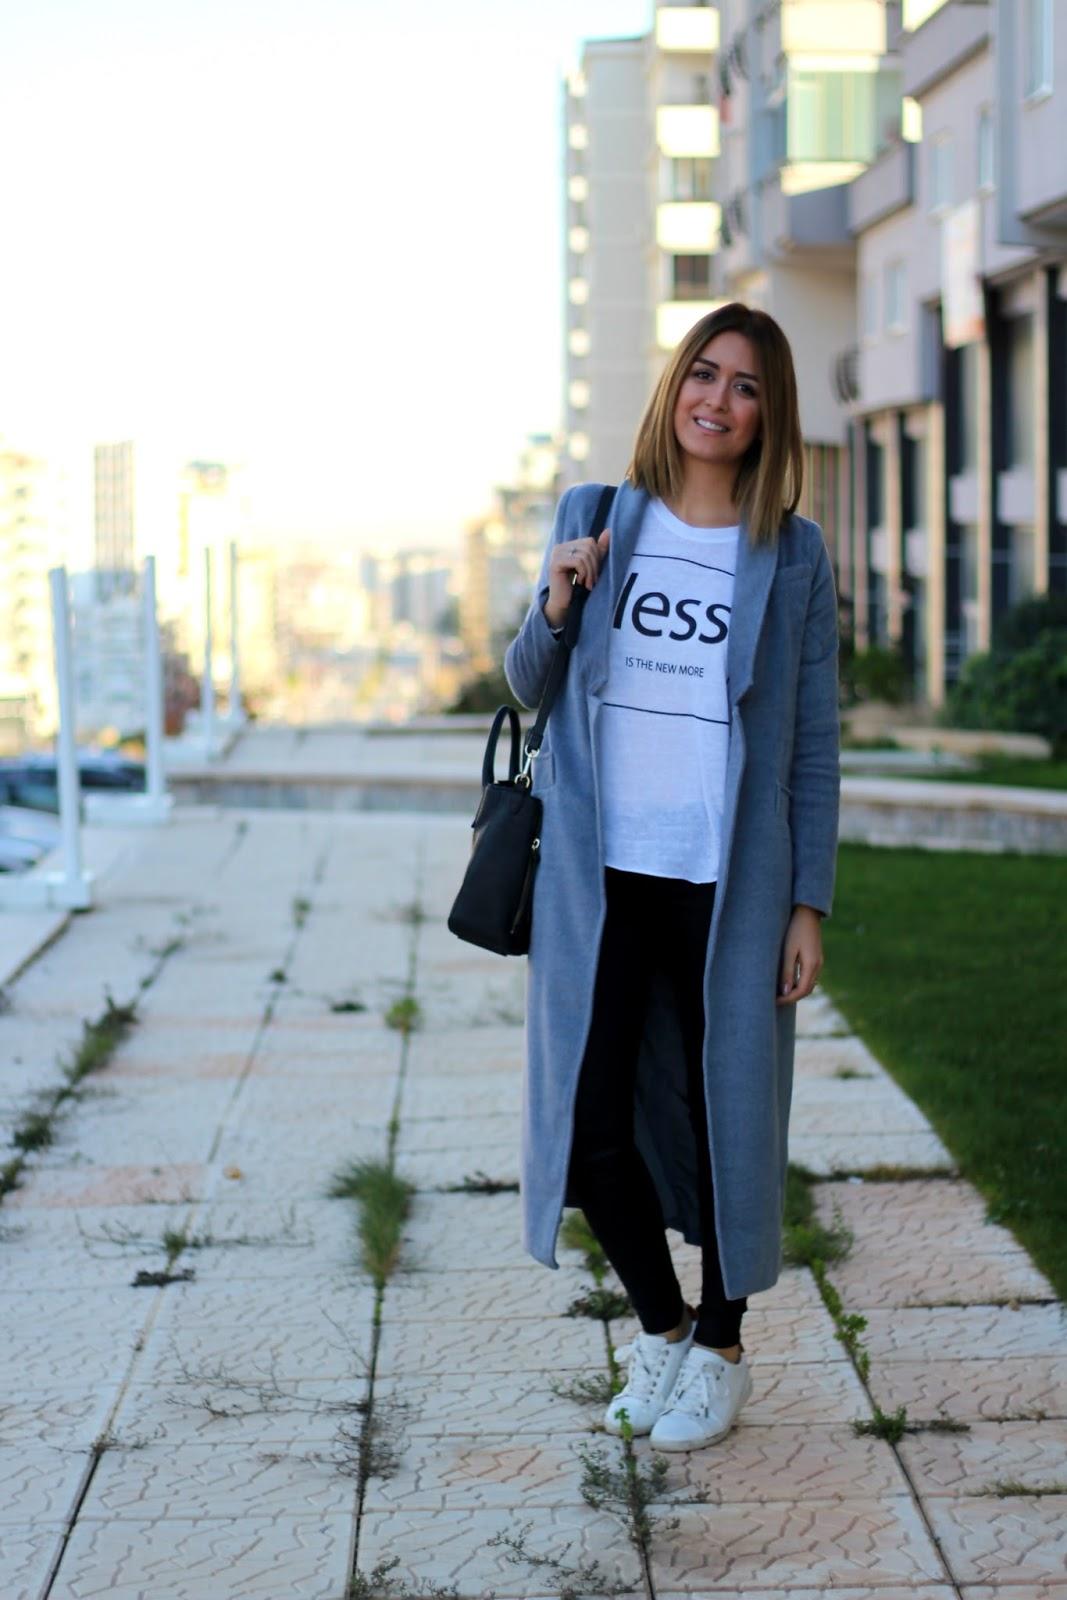 cfb0d4ab12161 Sosyete Fashion: Aralık 2015